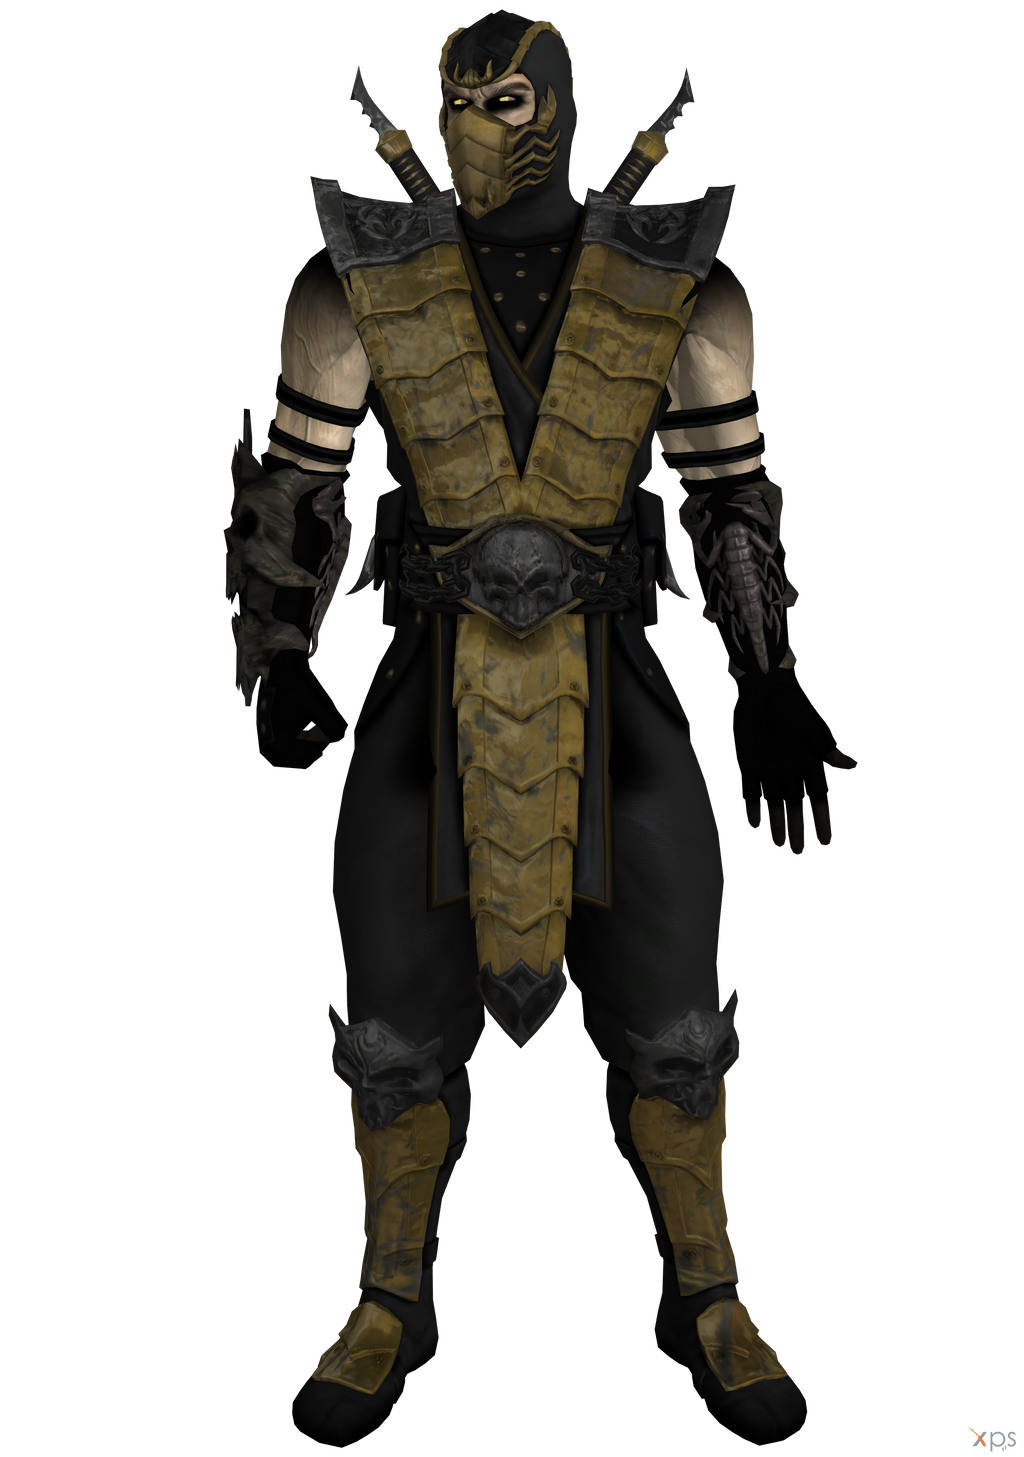 Scorpion- Alternate Costume. (Fixed) by OGLoc069 on DeviantArt